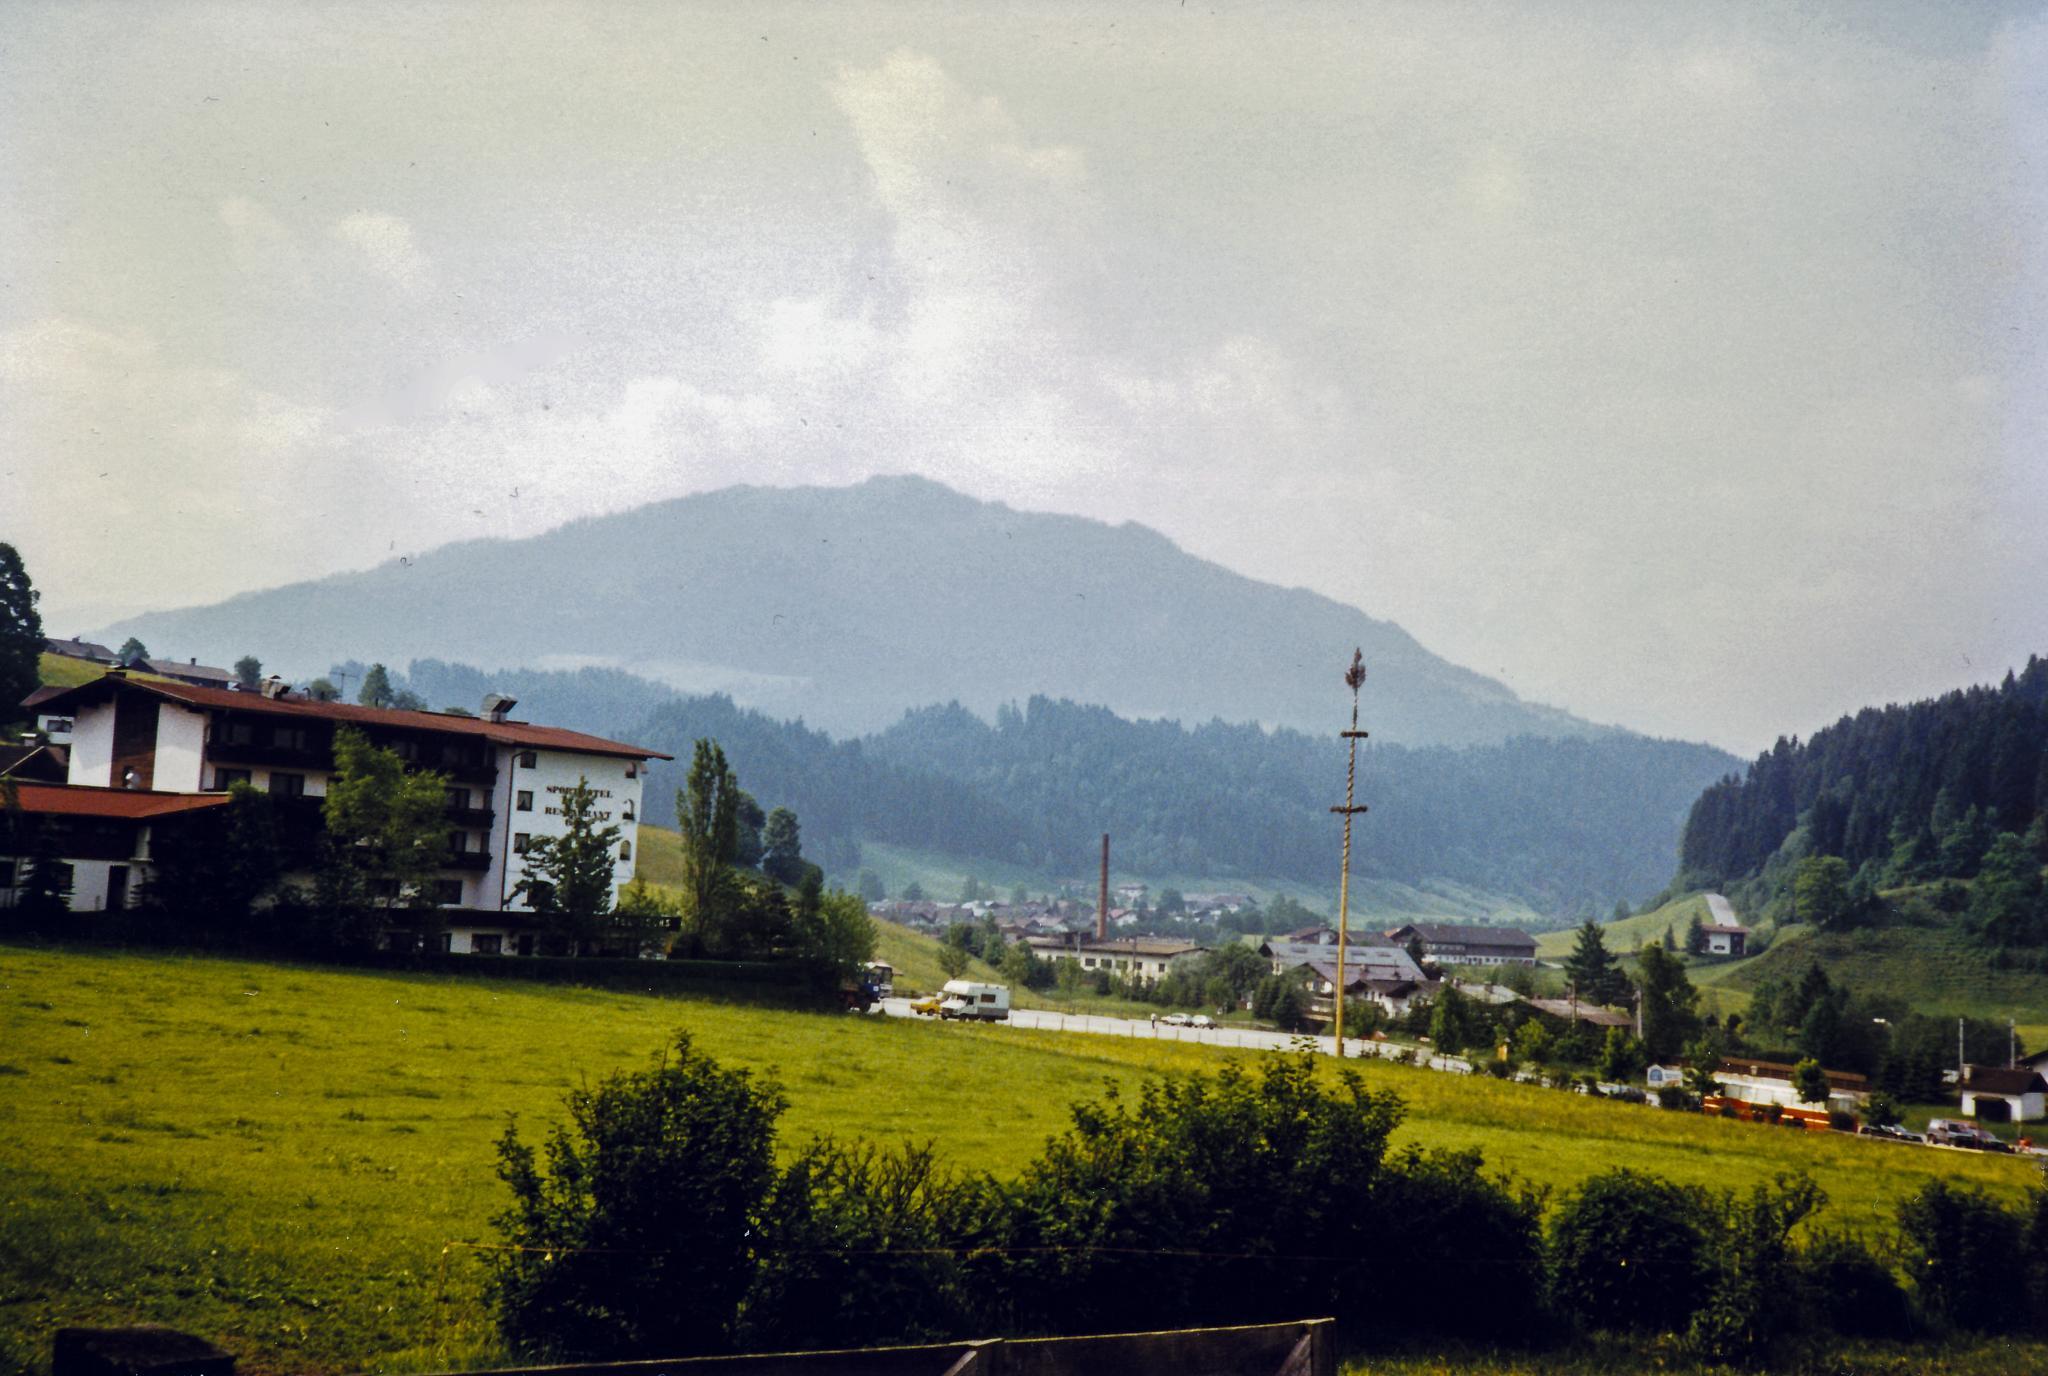 Hopfgarten in May 1990 by Carl Hult